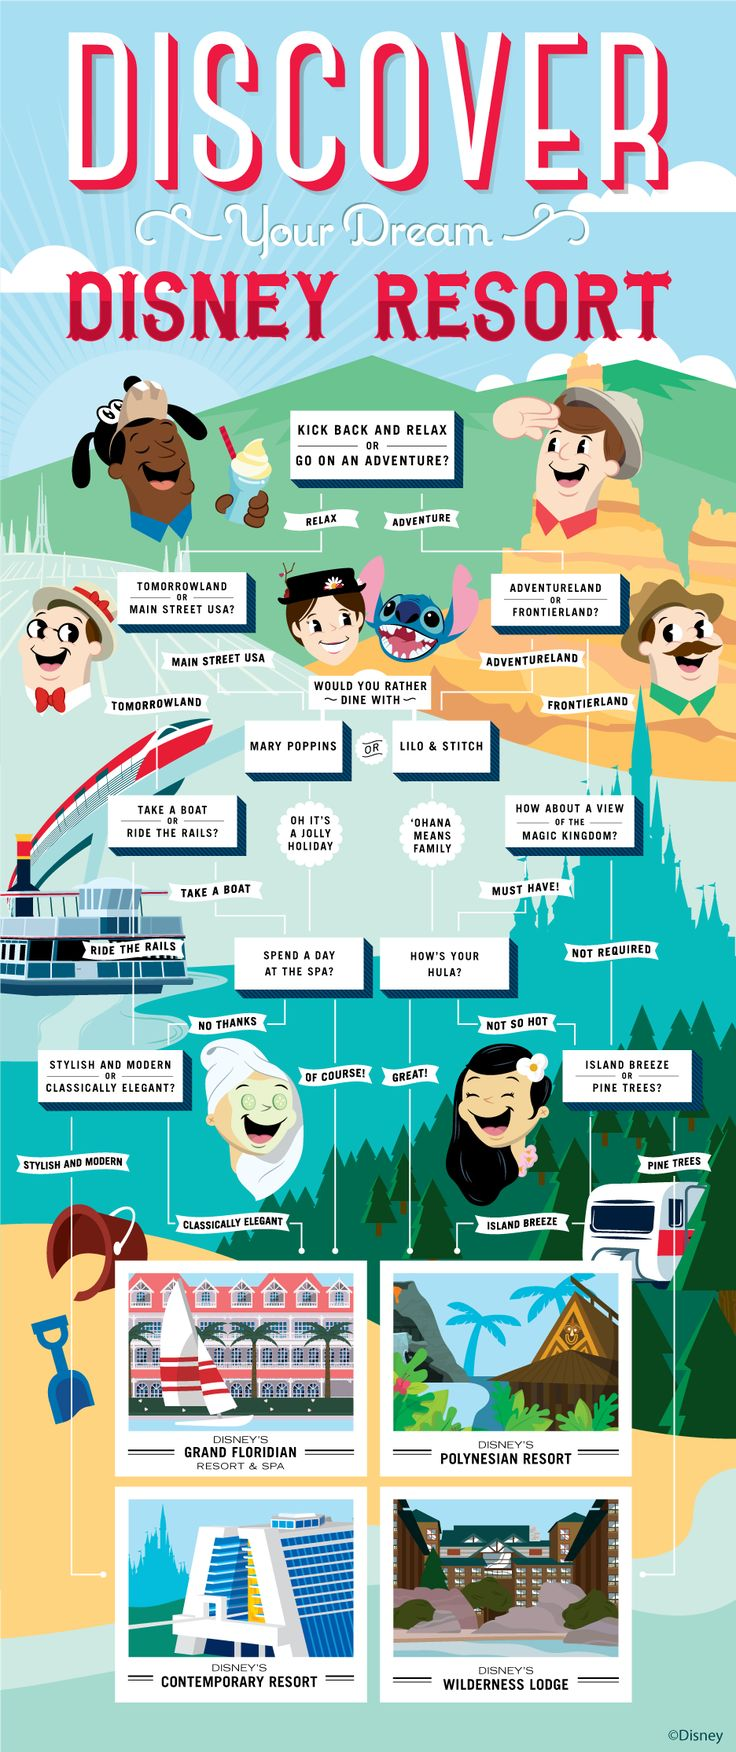 Discover Your Dream Disney Resort Hotel! #WaltDisneyWorld